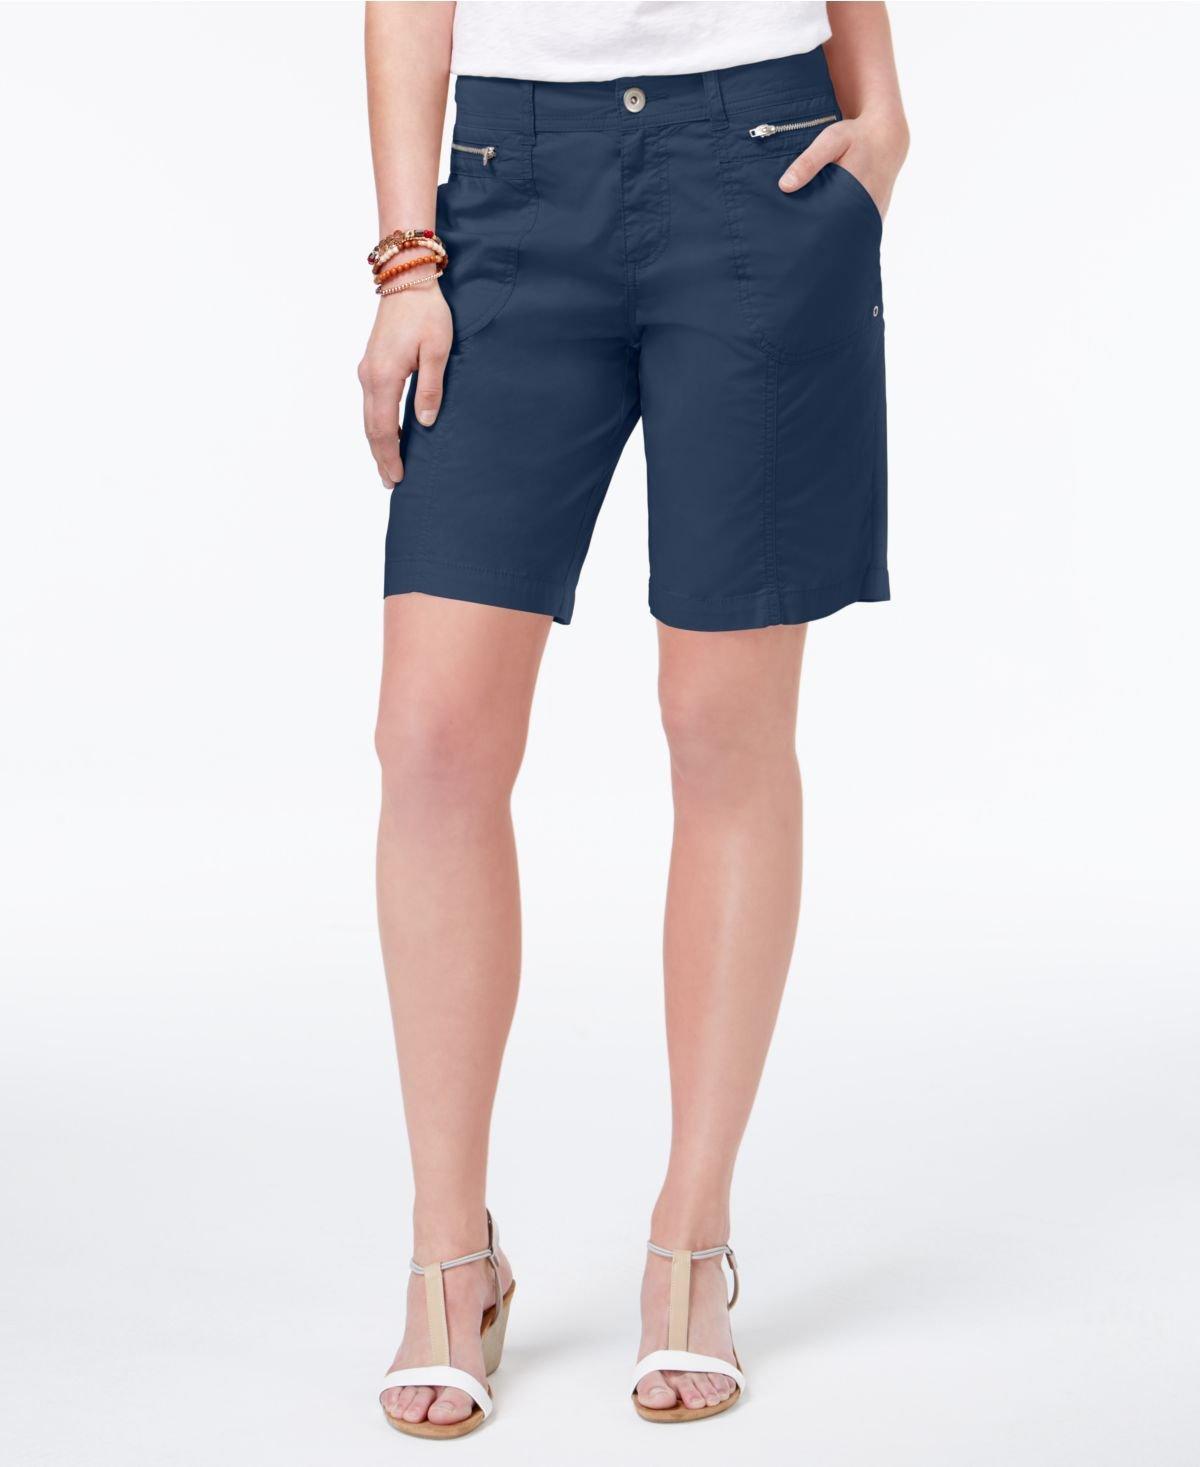 Style & Co. Zippered-Pocket Shorts (Deep Black, 16)